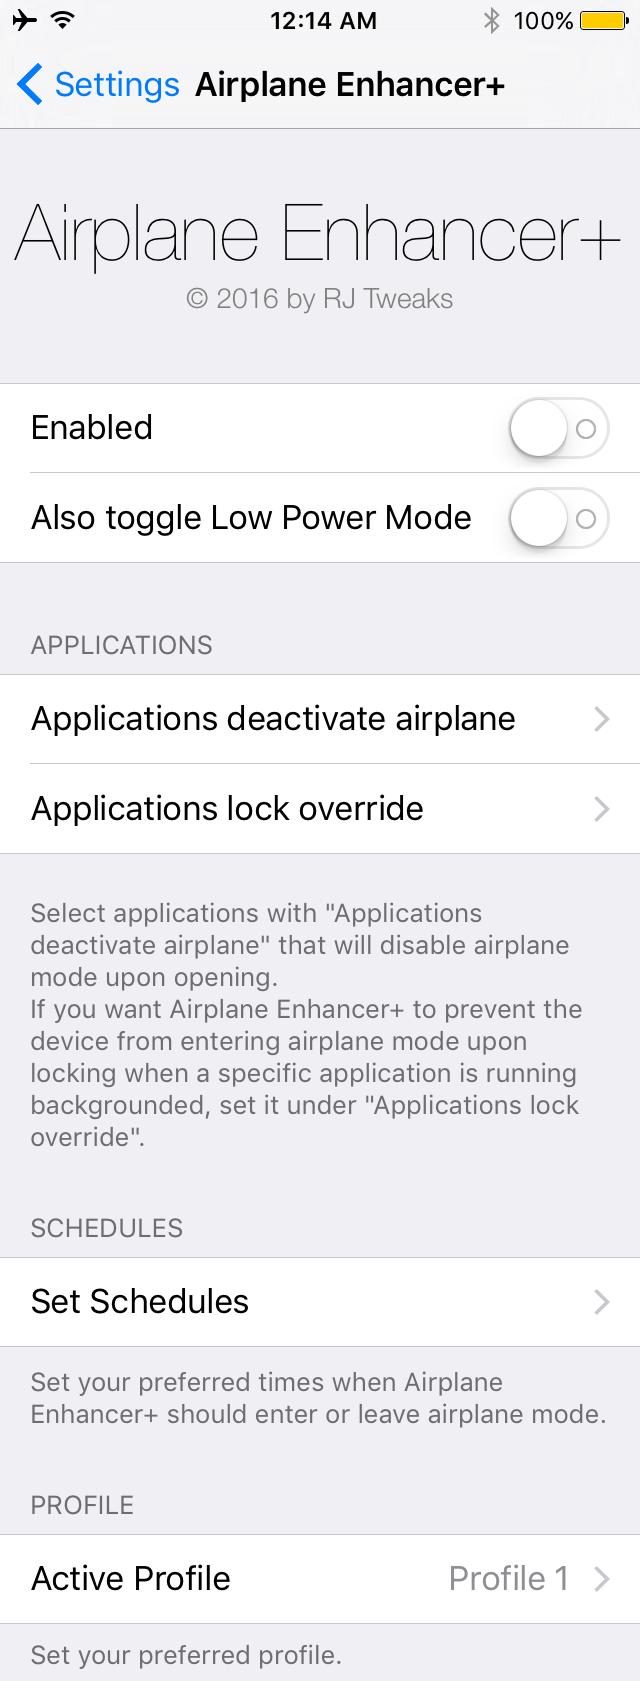 Airplane Enhancer+ preferences pane